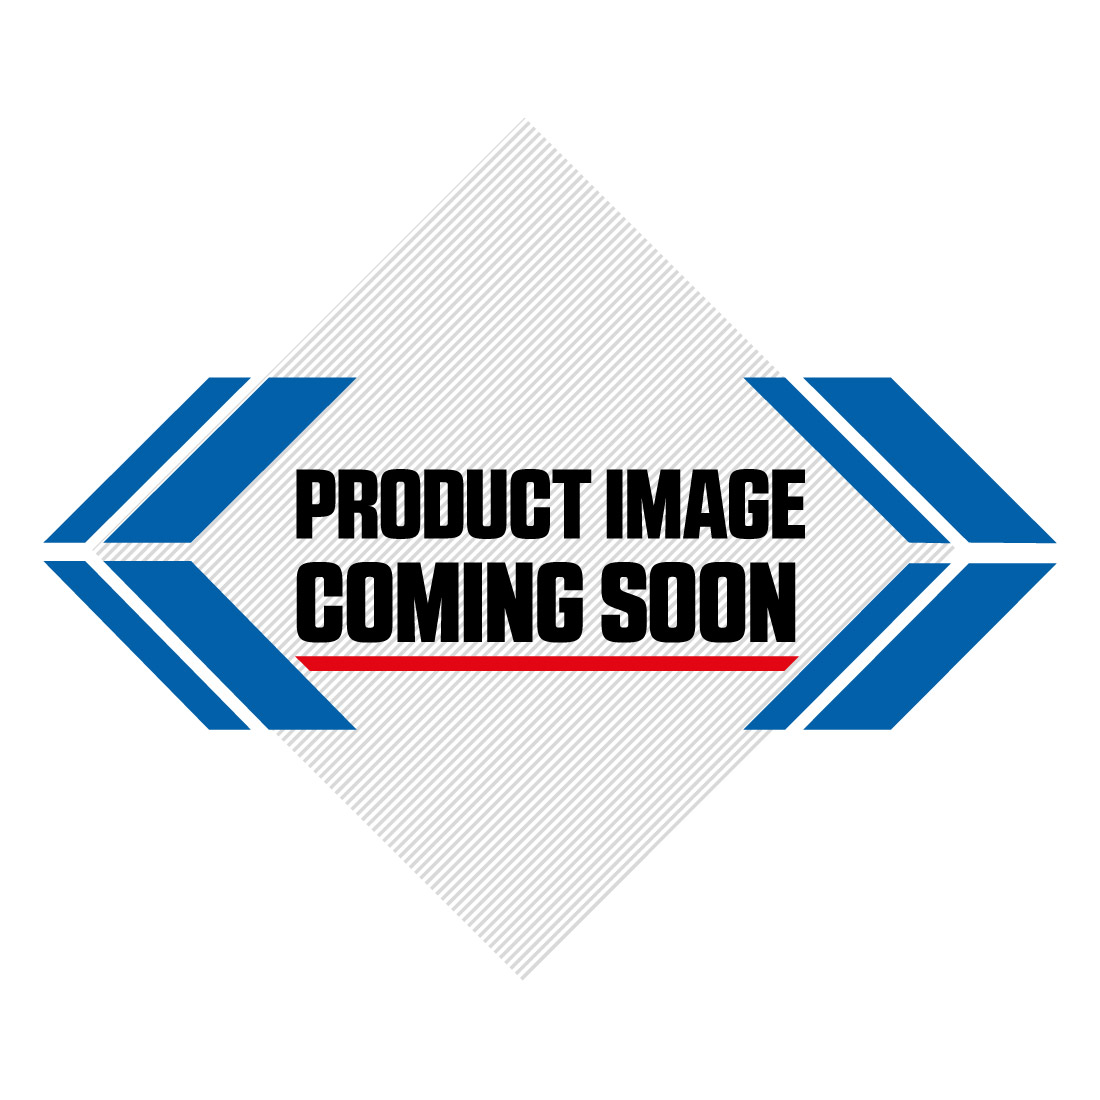 UFO Honda Radiator louvers CRF 450R (17-20) CRF 450RX (17-20) OEM Factory Image-0